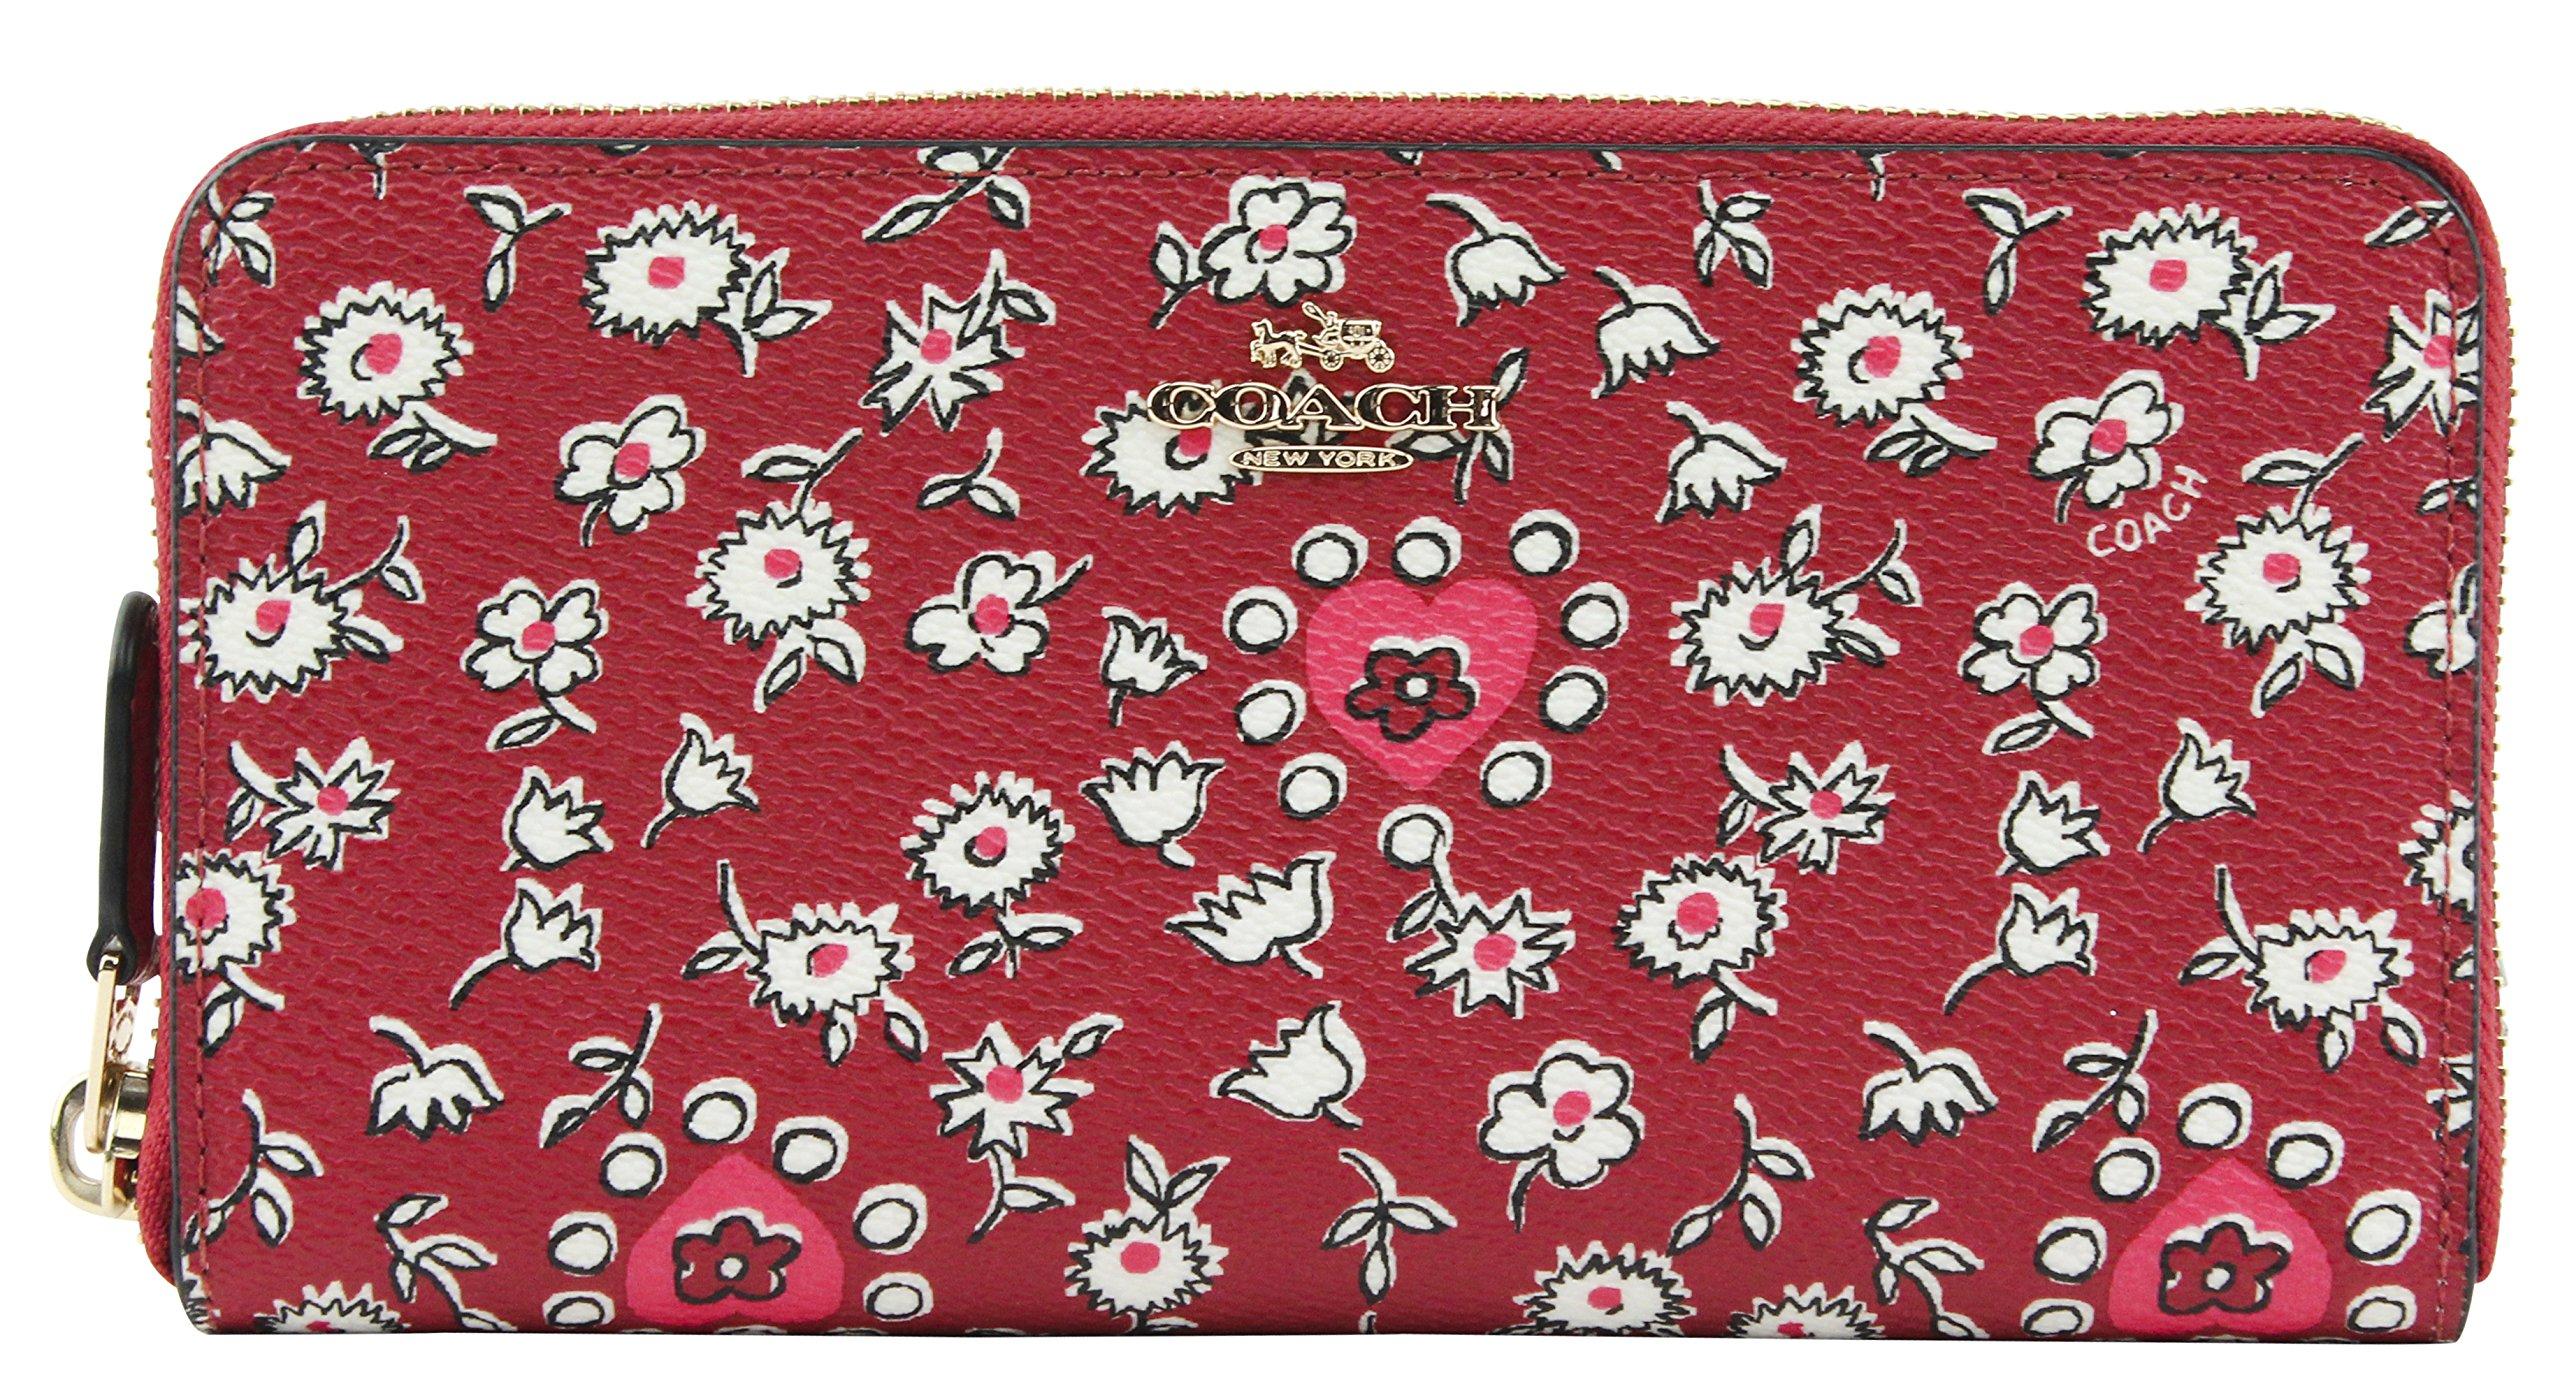 Coach Women's Wild Heart Print Accordion Zip Around Wallet, Style F57832, Red Multi